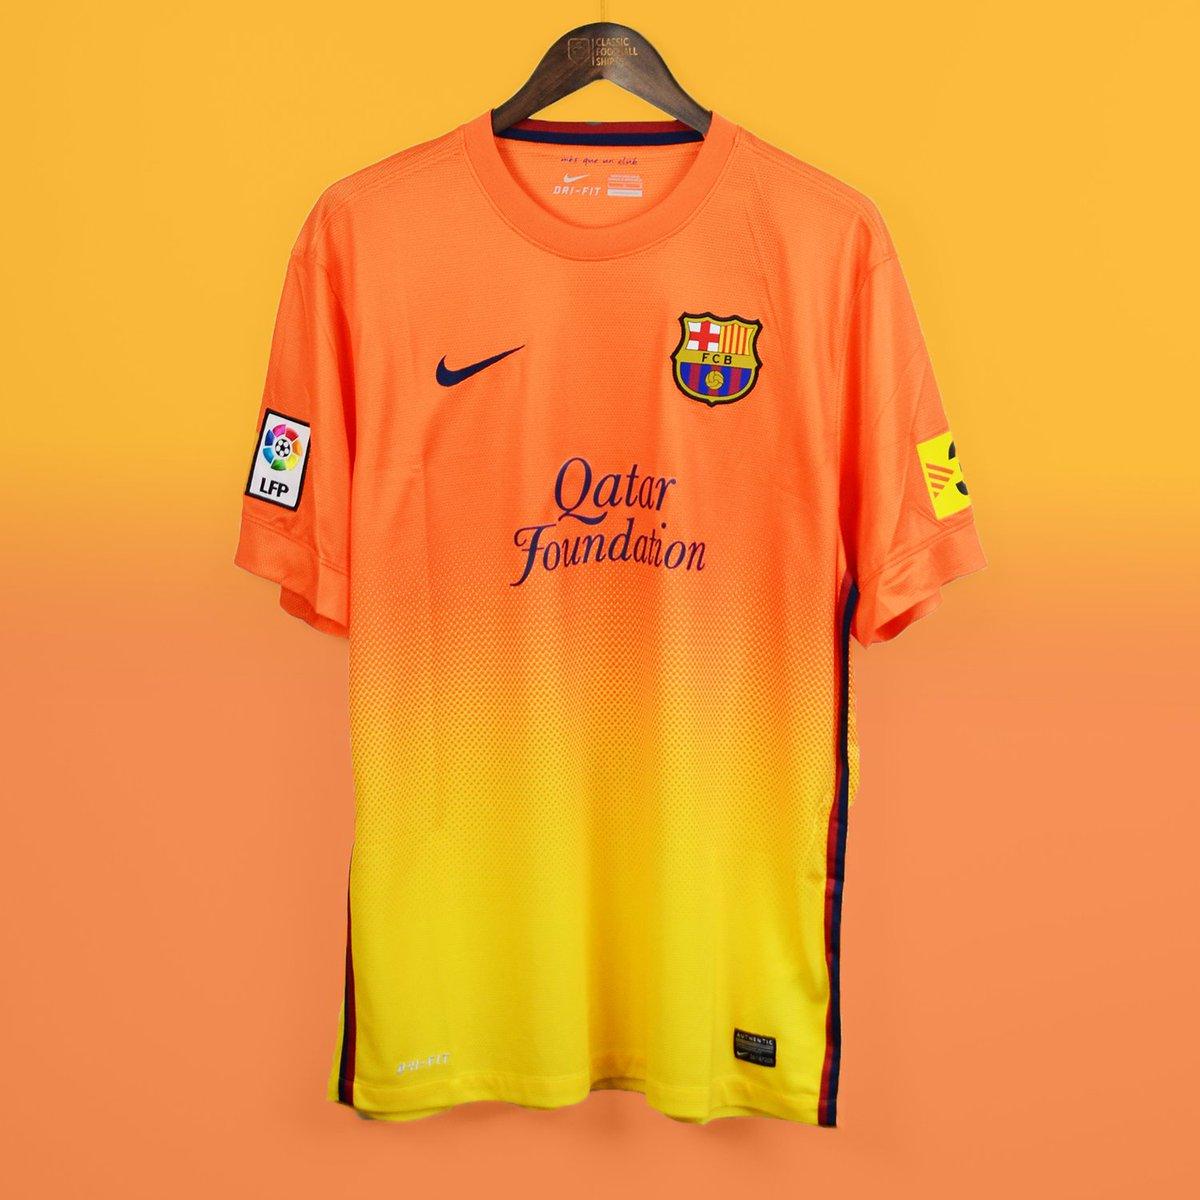 hot sale online 0d0e2 828f9 Classic Football Shirts on Twitter: